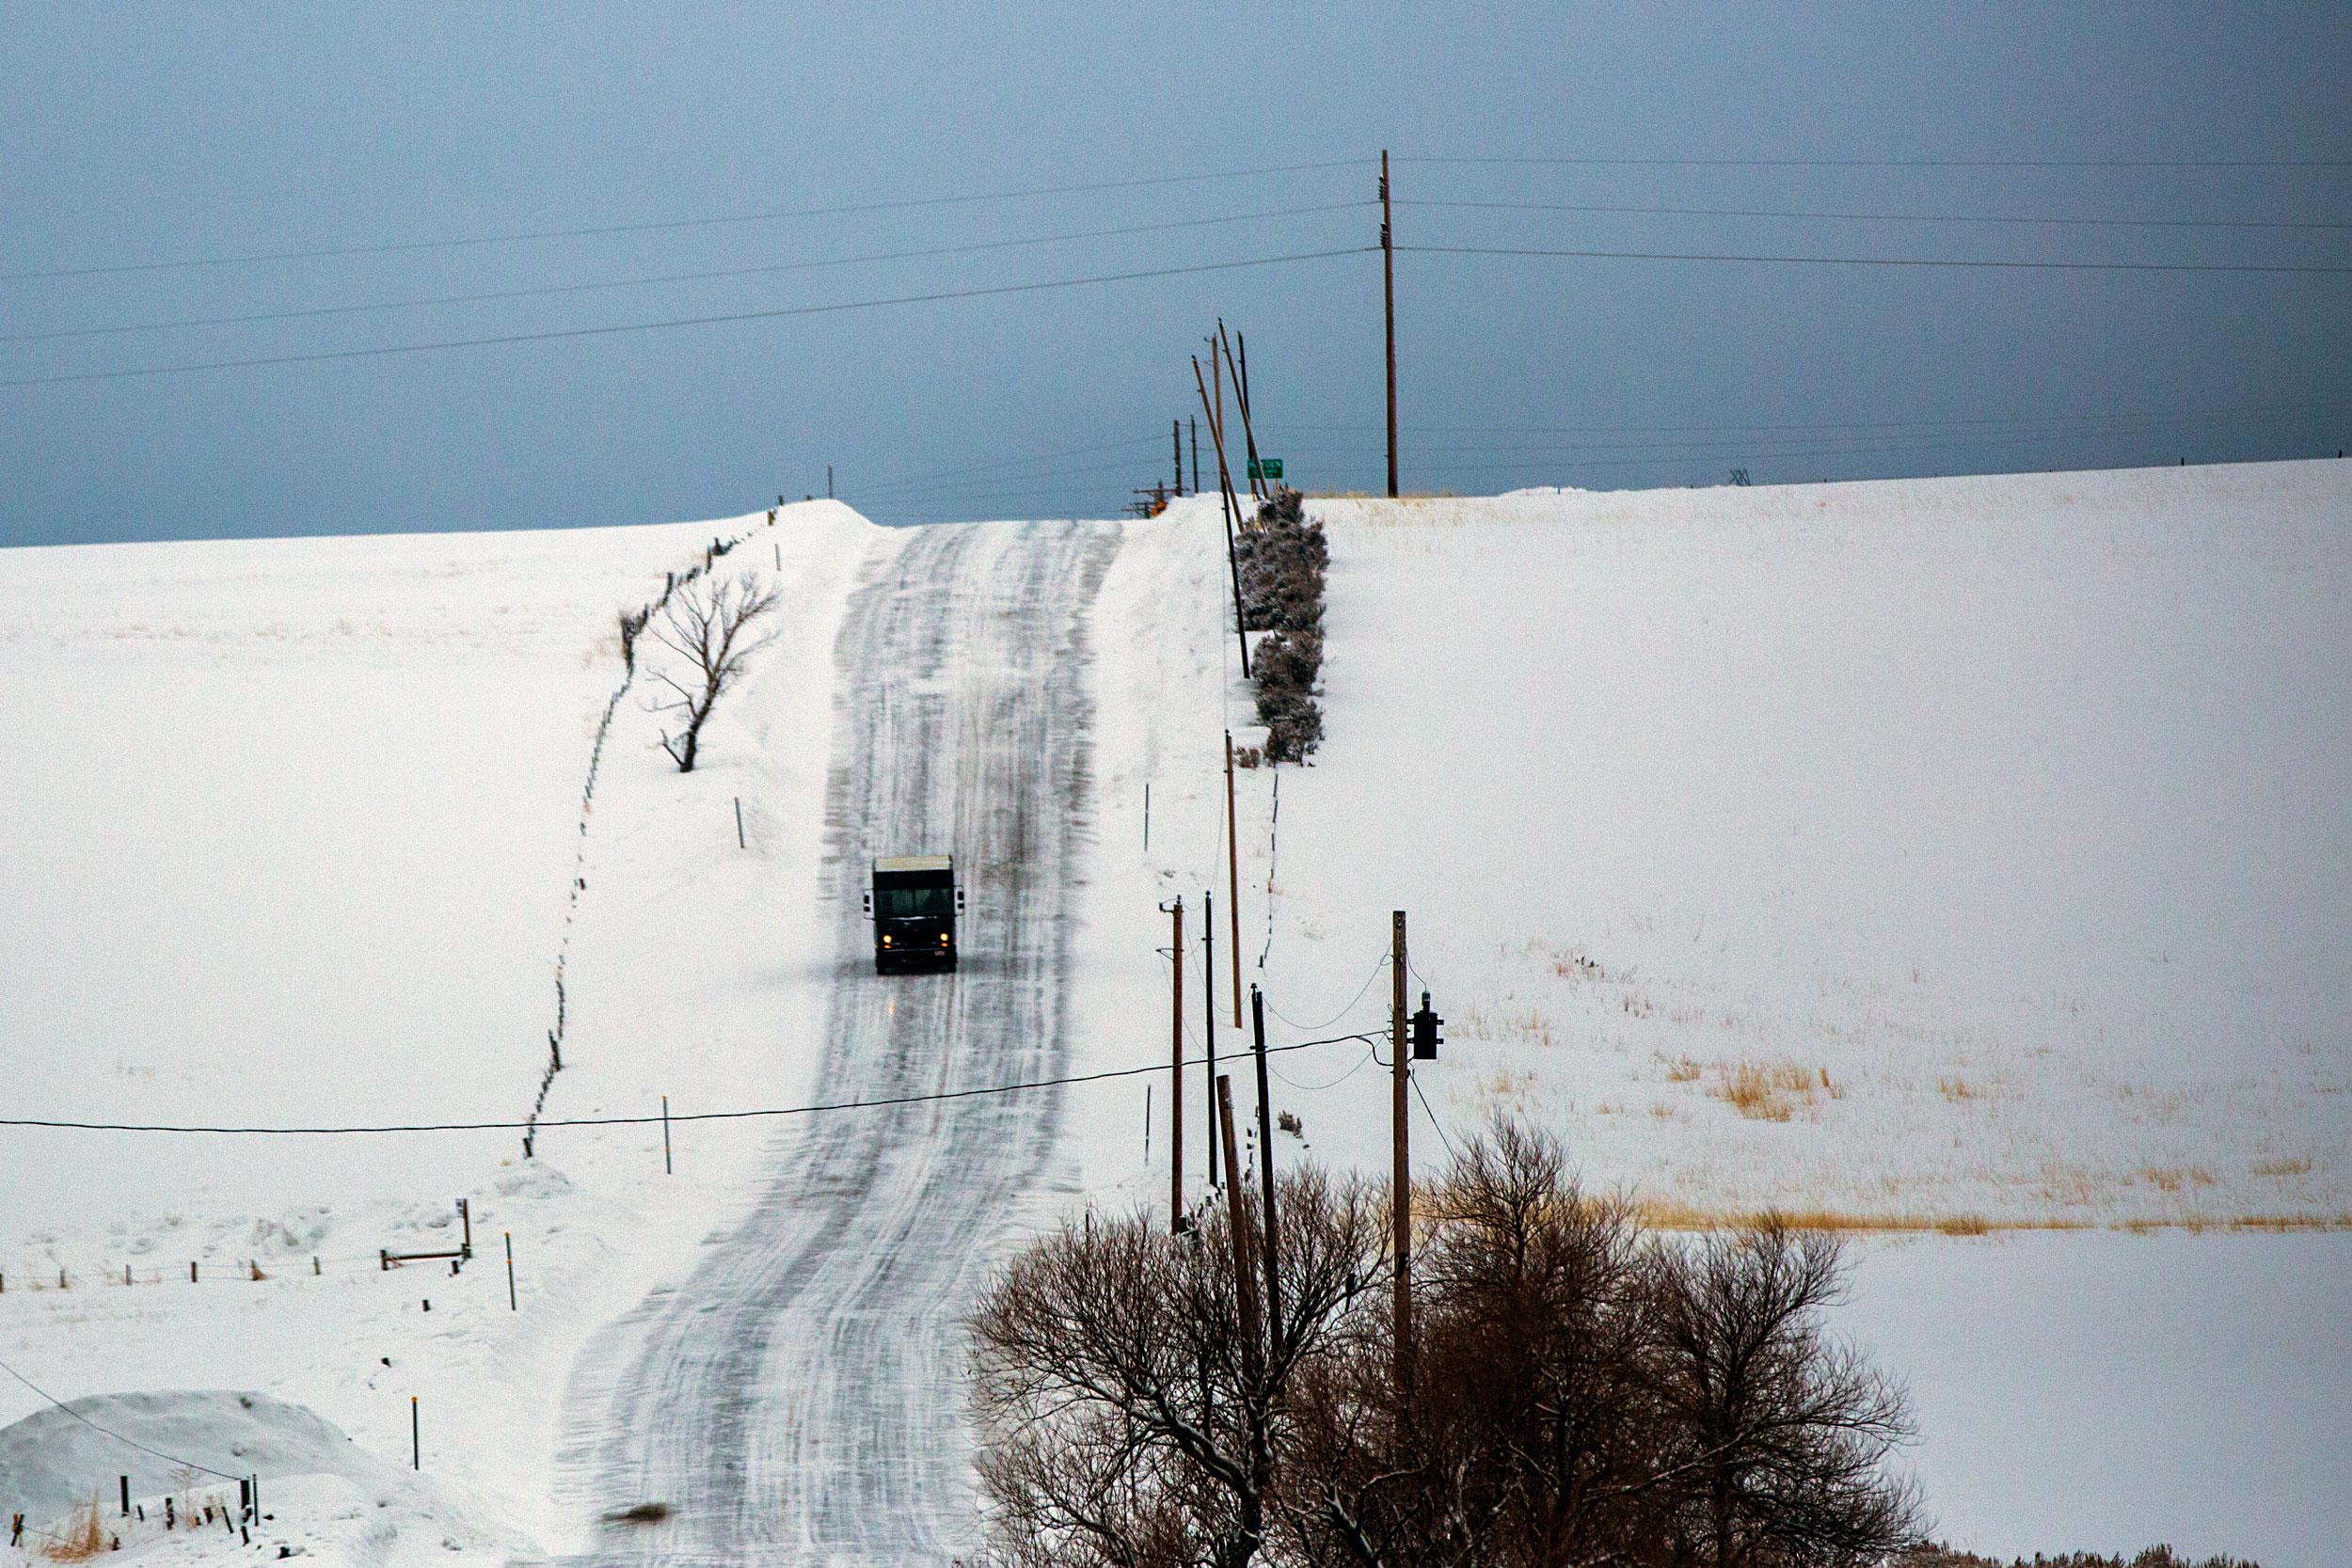 Craig Steamboat Winter Driving